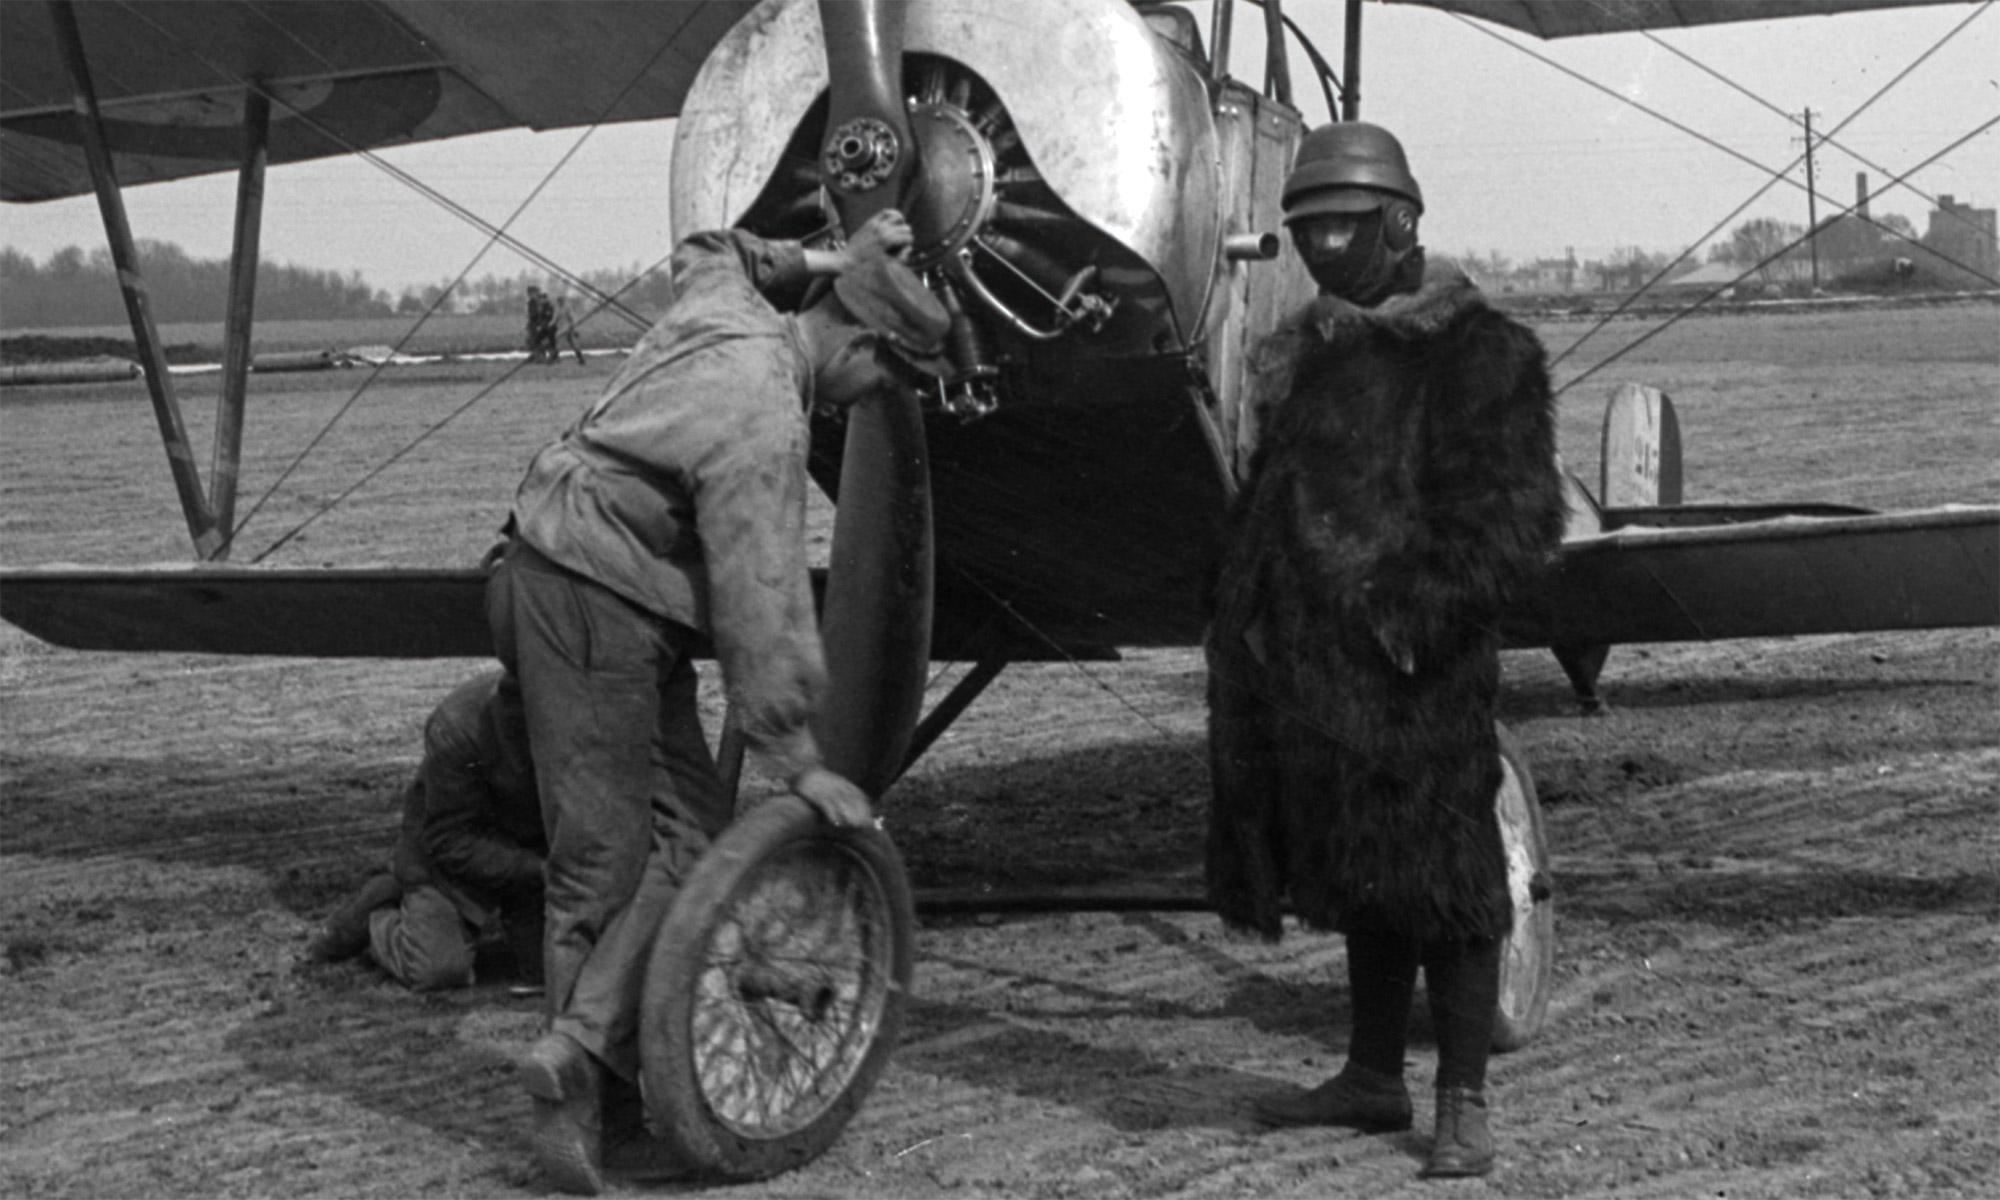 Header image by A. O. Fasser - a Nieuport XB Biplane